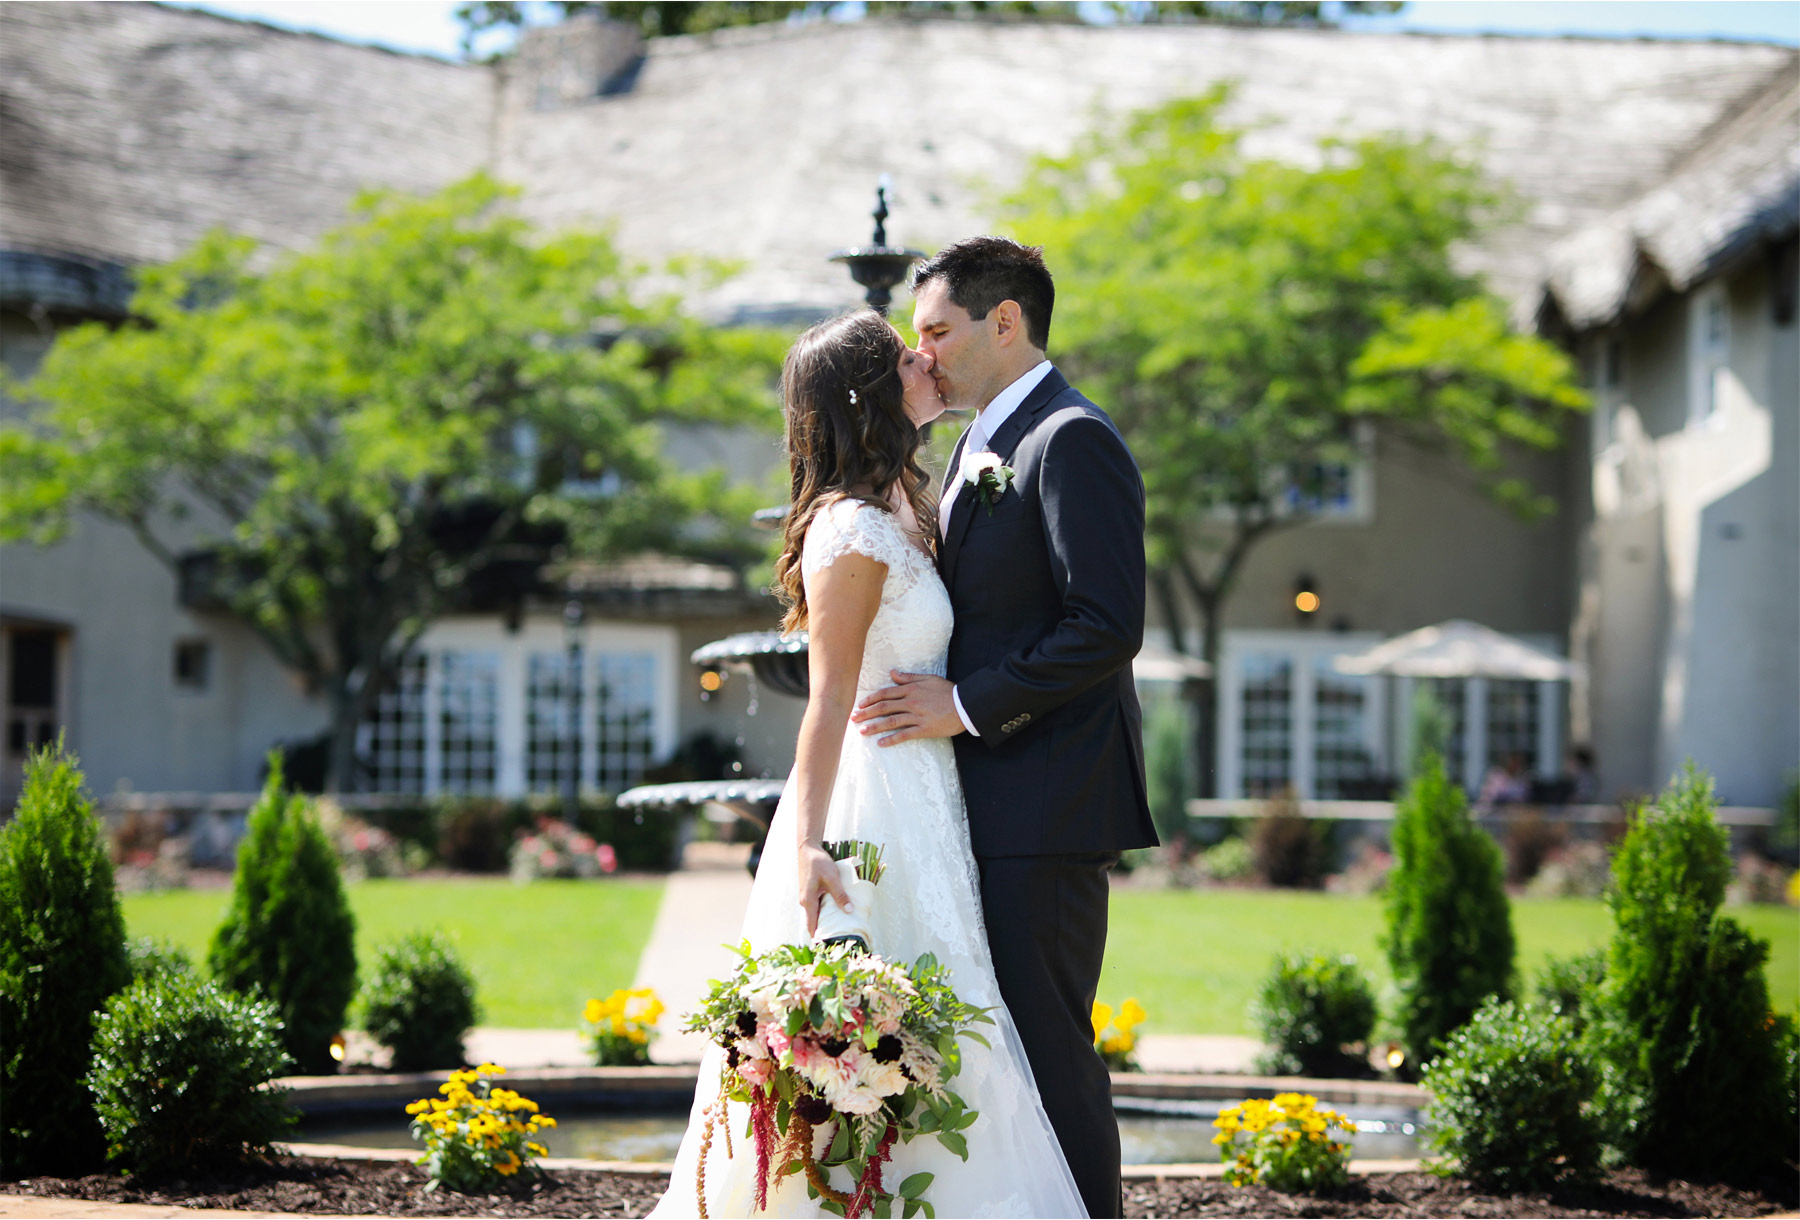 08-Weding-by-Vick-Photography-Minneapolis-Minnesota-Bavaria-Downs-Bride-Groom-Fountain-Kiss-Rebecca-and-Mark.jpg